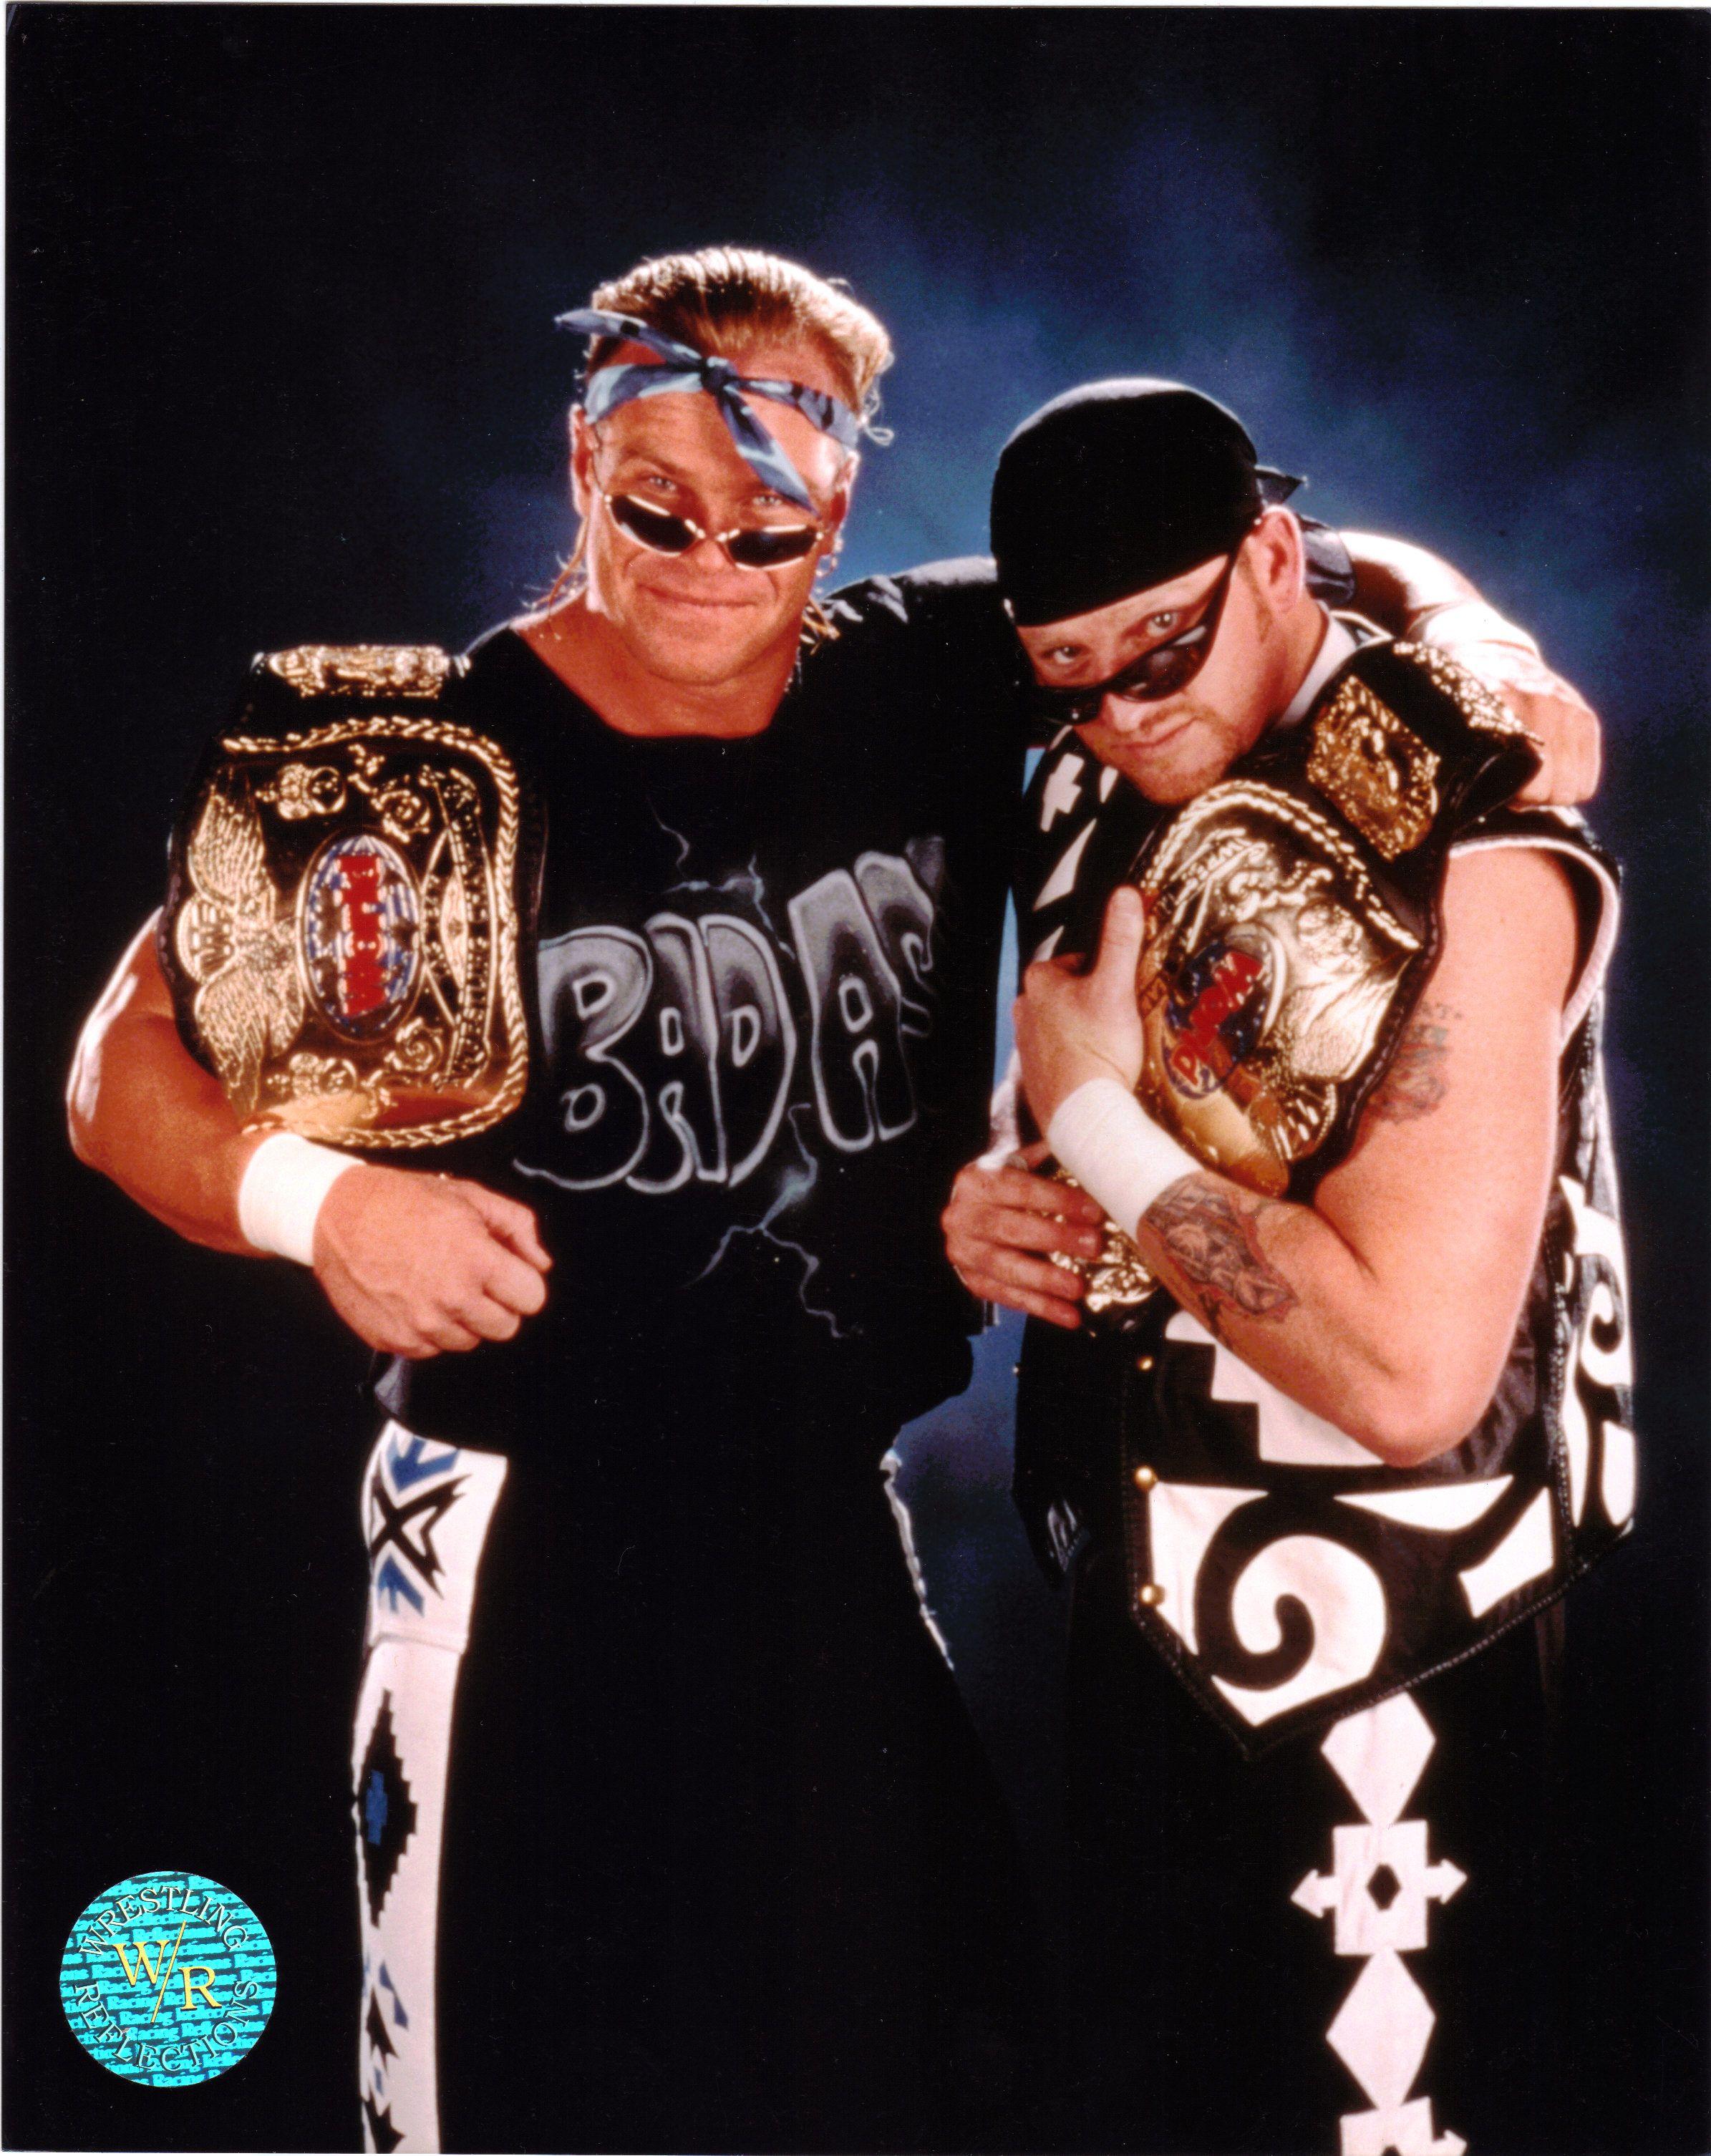 New Age Outlaws Wrestling Stars Wrestling Superstars Professional Wrestling